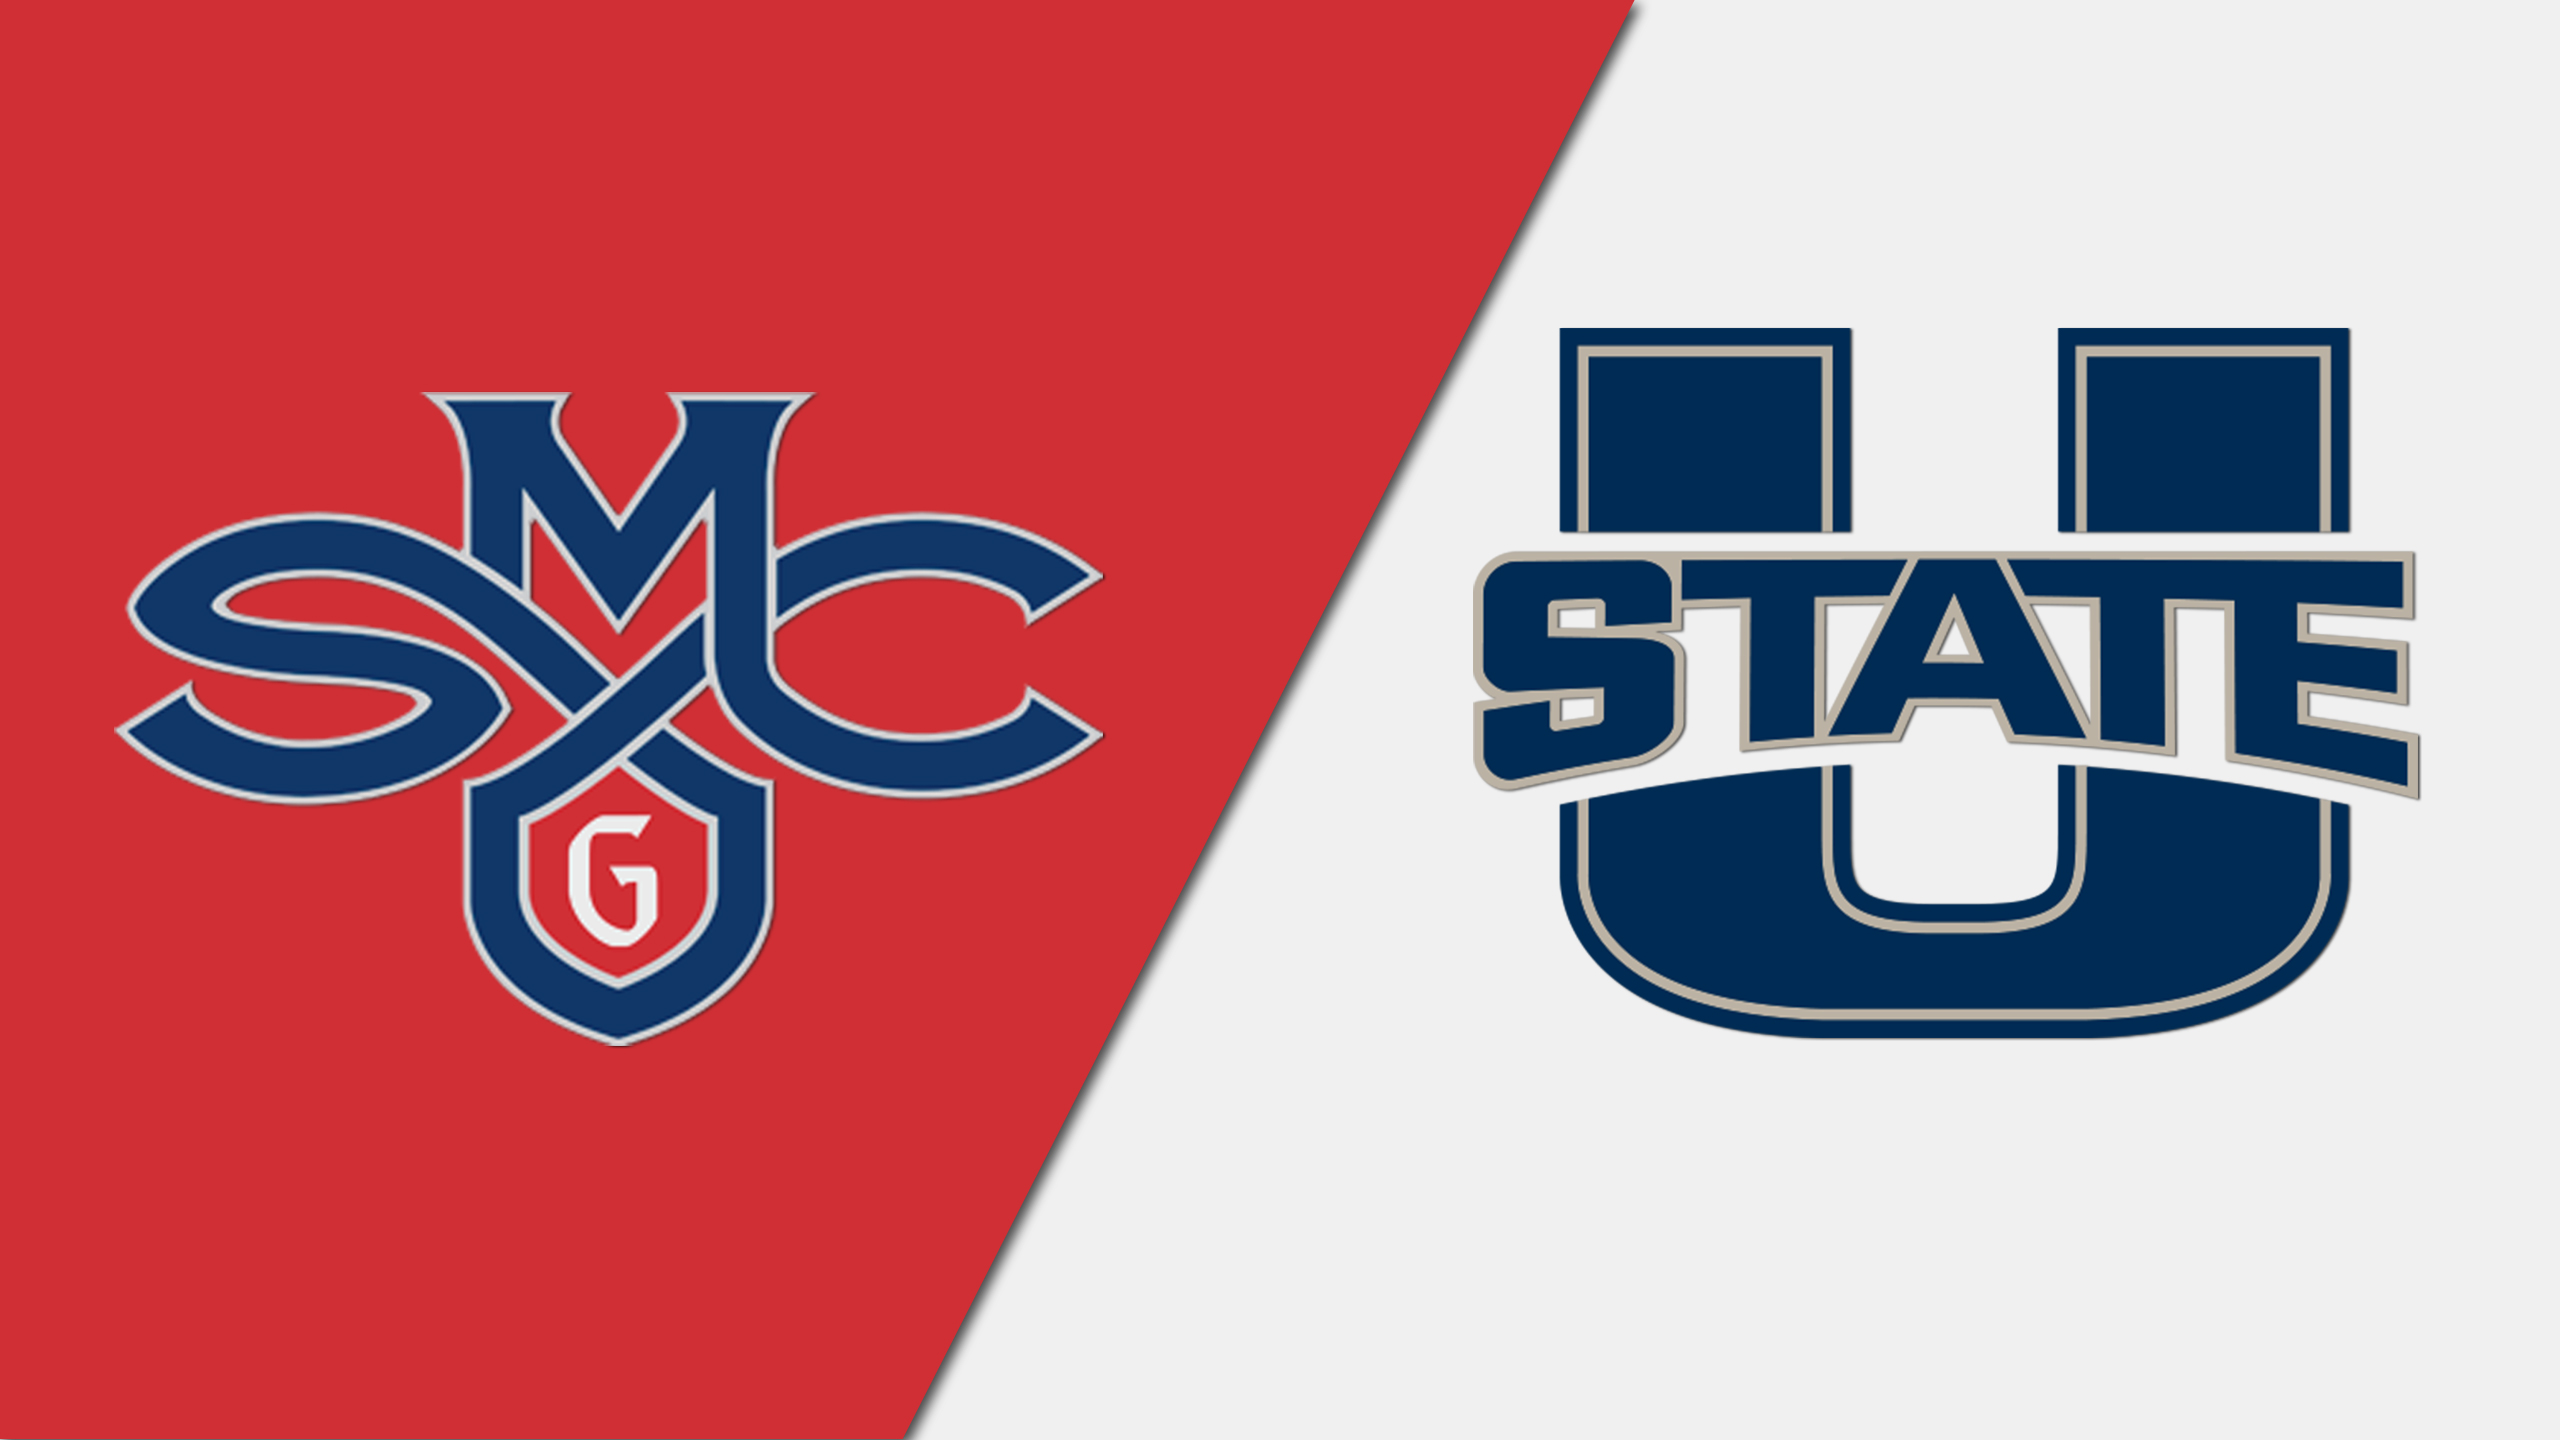 Saint Mary's vs. Utah State (Semifinal #1) (MGM Resorts Main Event)